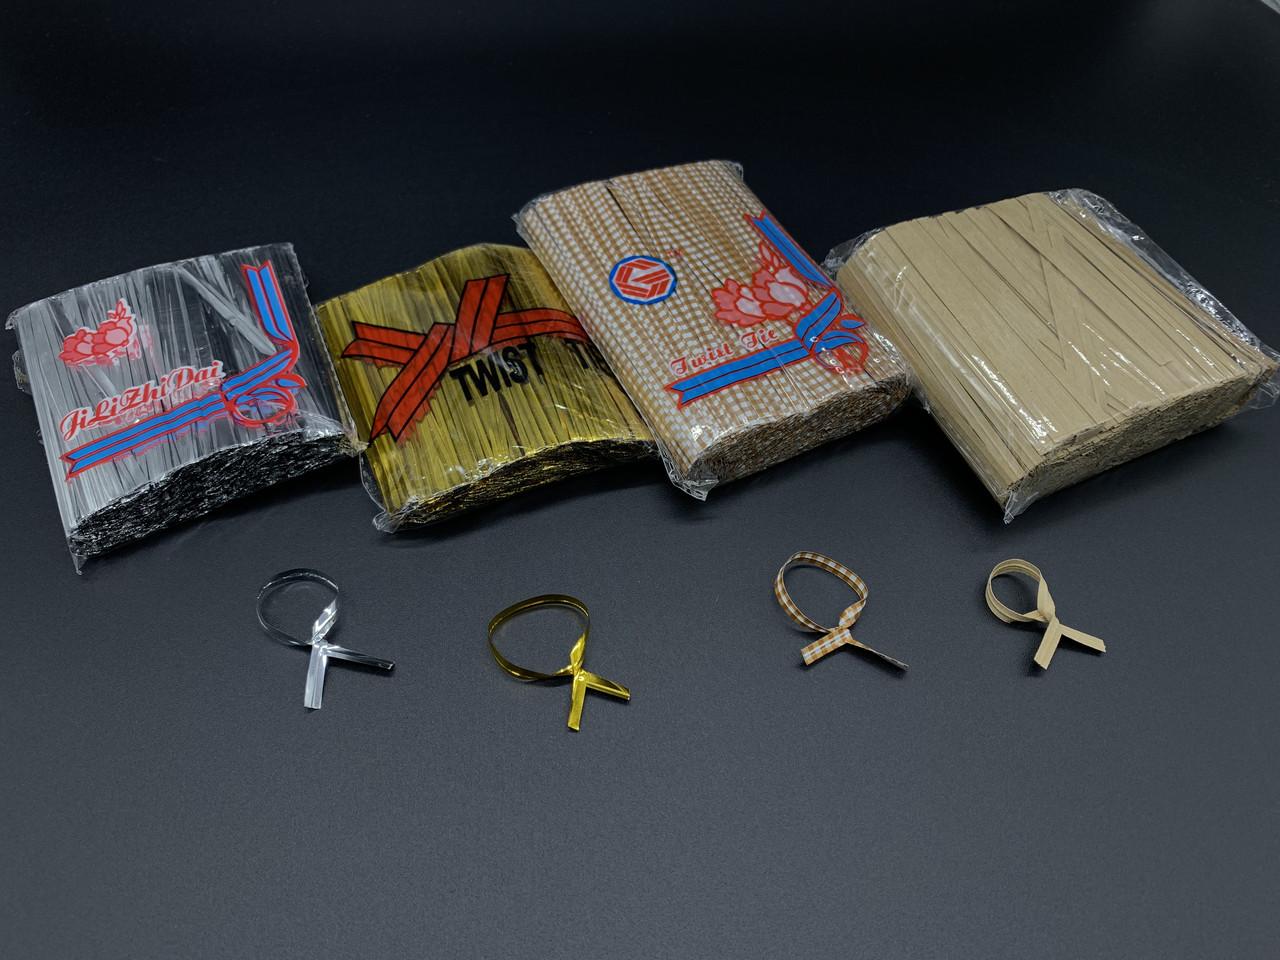 Скрутки завязки для пакетов. Бумага крафт. 8см. 1000шт/уп